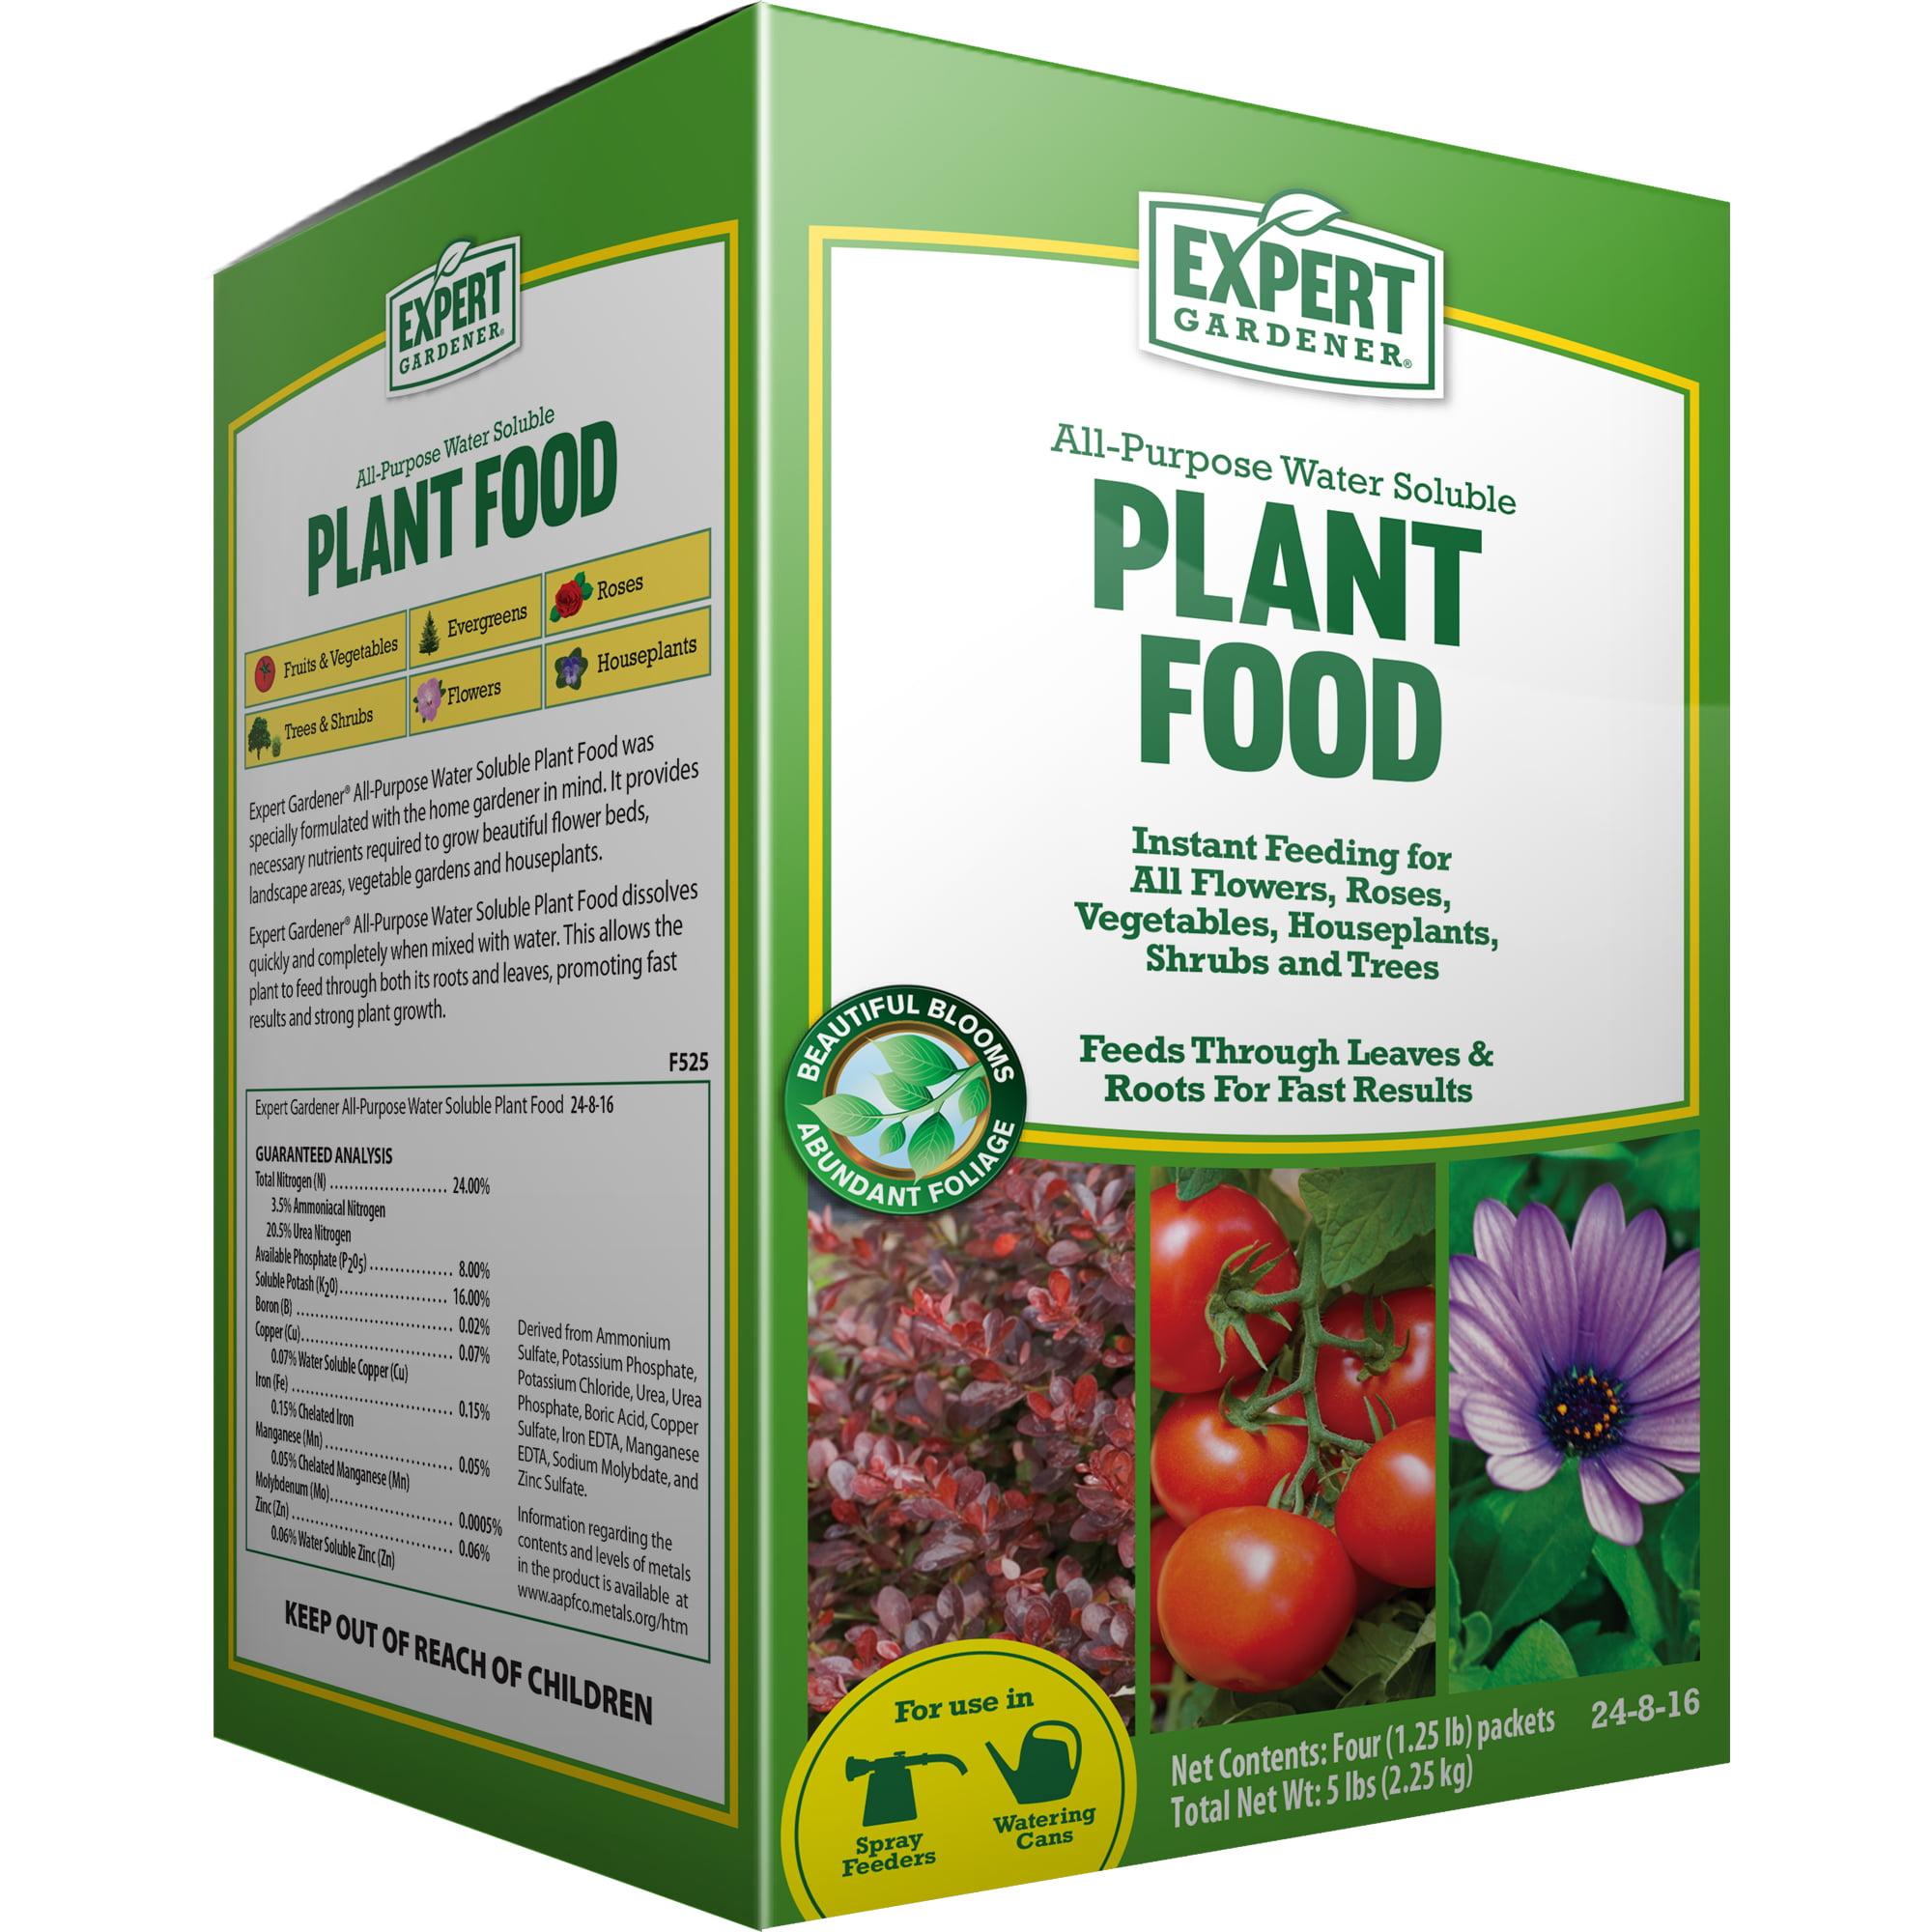 Expert Gardener All-Purpose Water Soluble Plant Food, 24-8-16, 5 lbs.